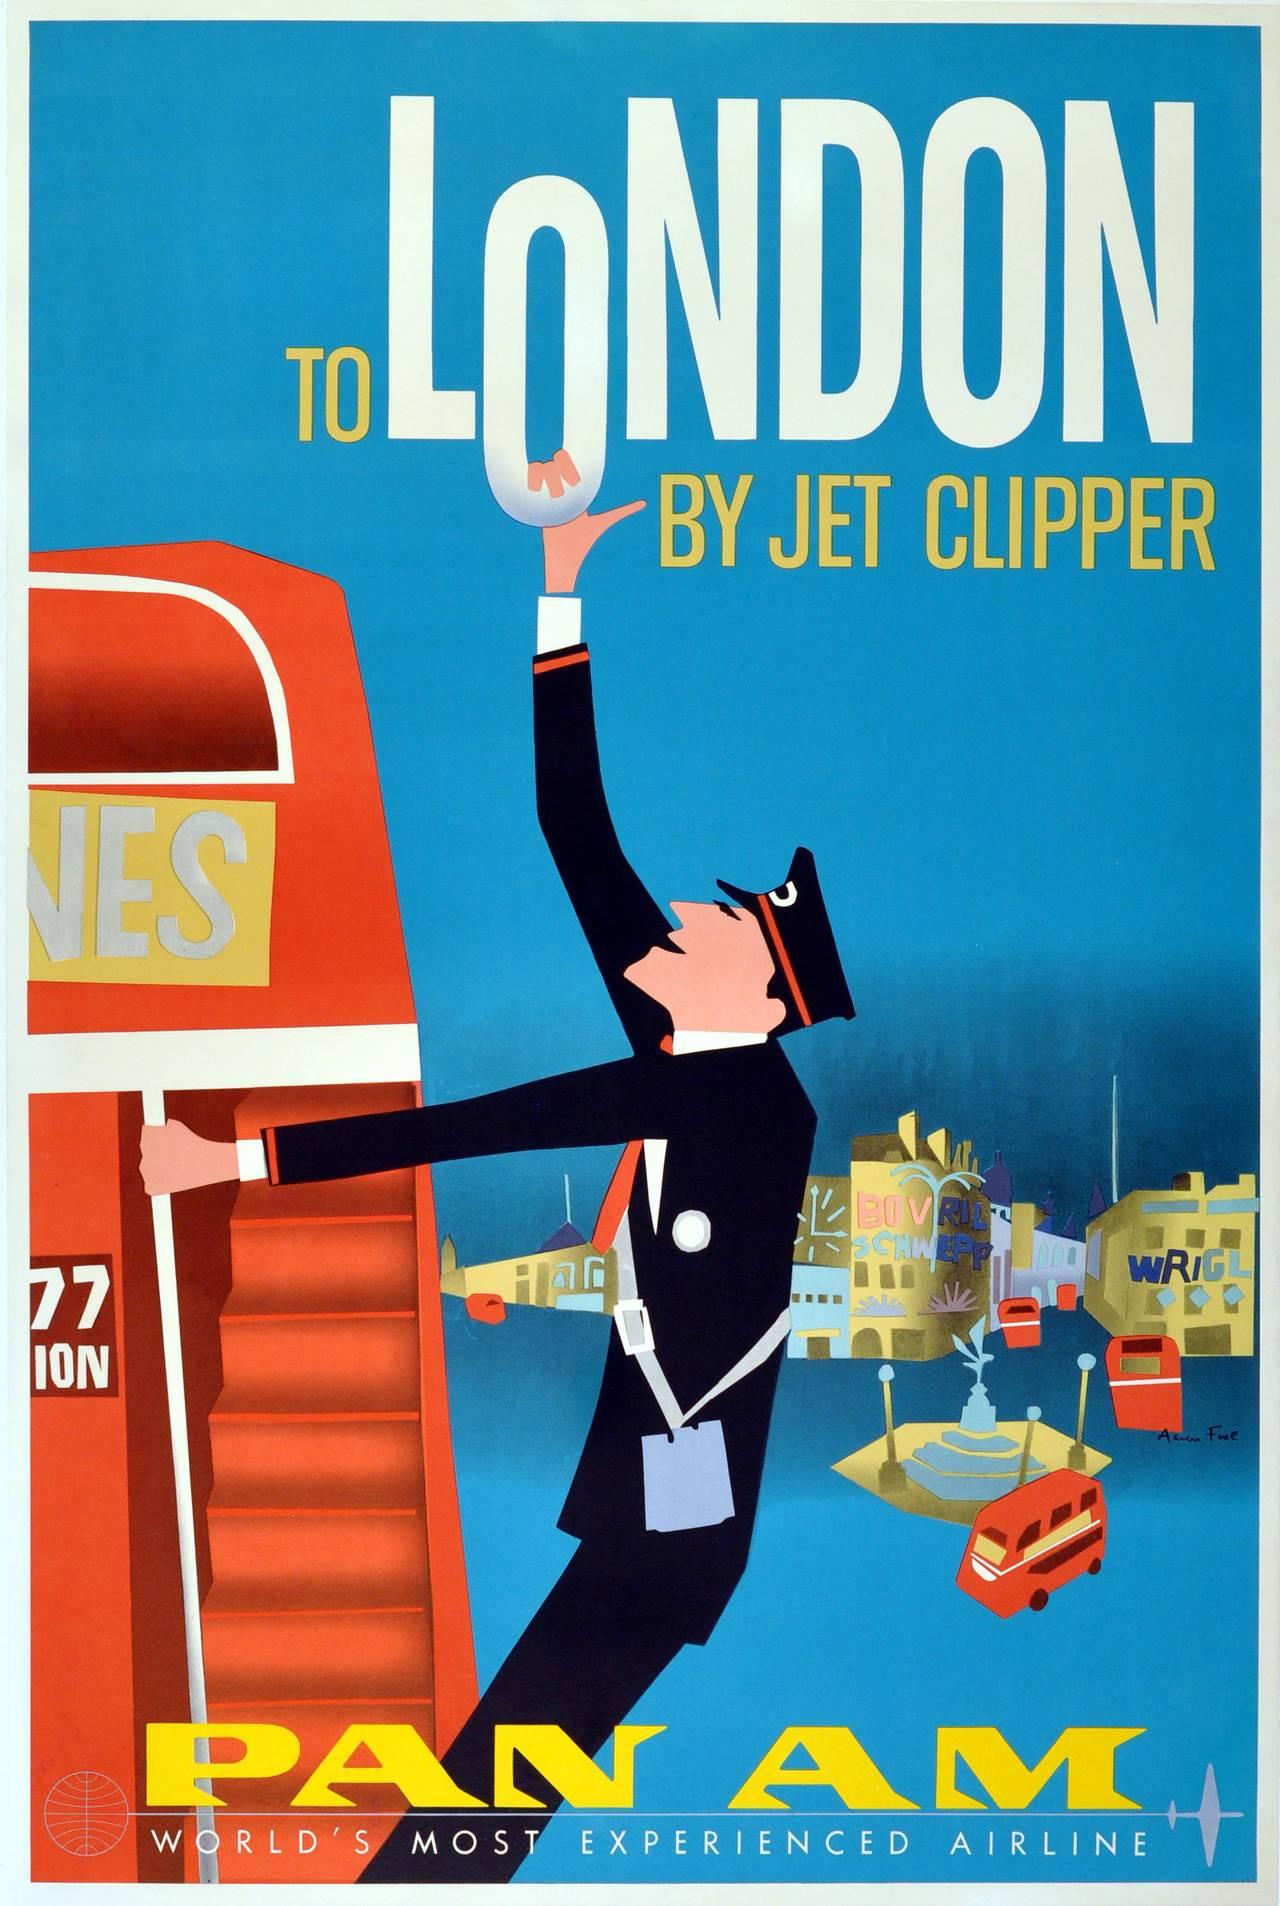 Aaron Fine - Original Vintage Travel Advertising Poster ...